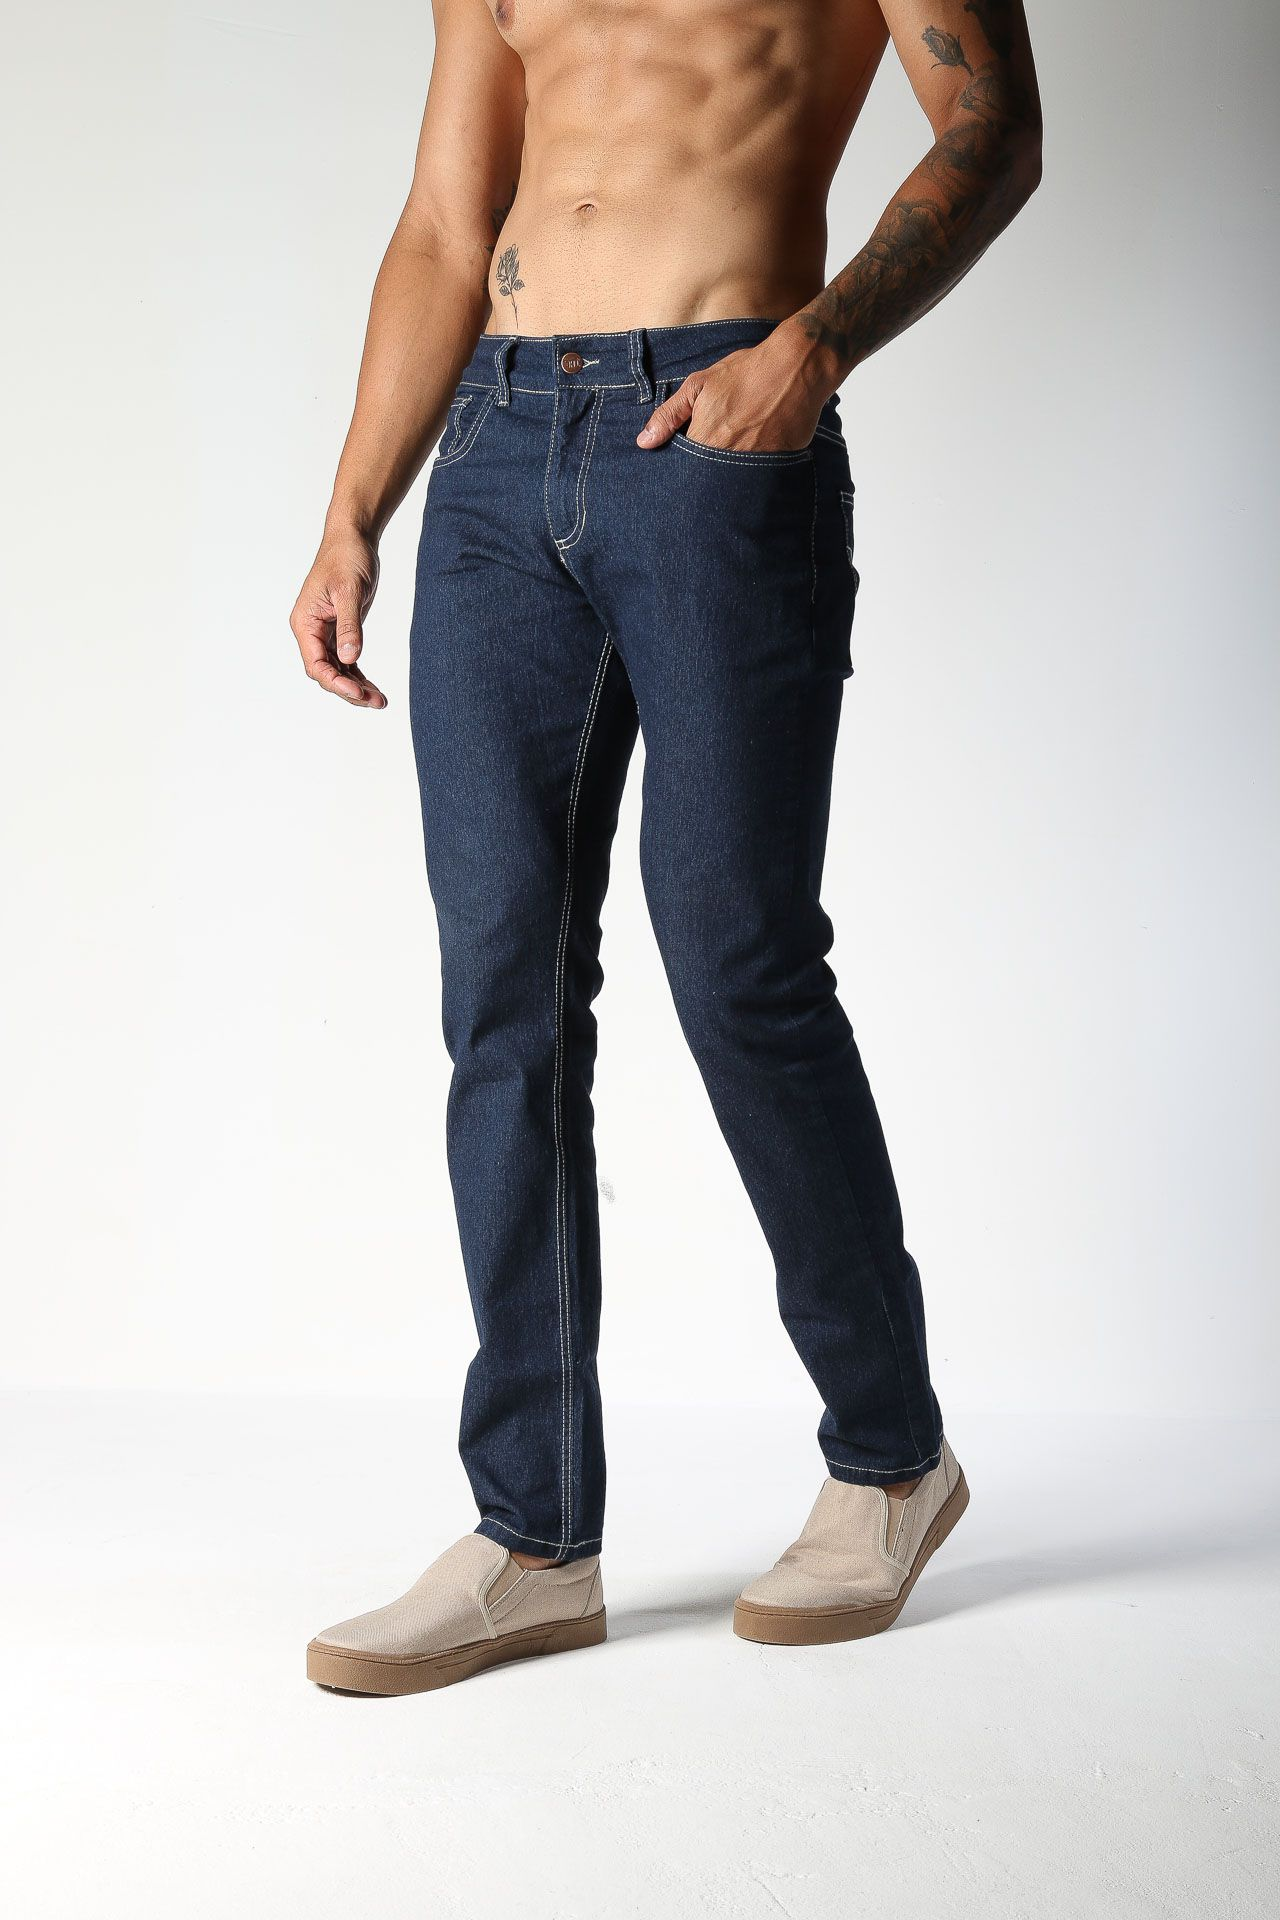 Calça Jeans TXC Masculina REGULAR AMACIADA 3% ELASTANO